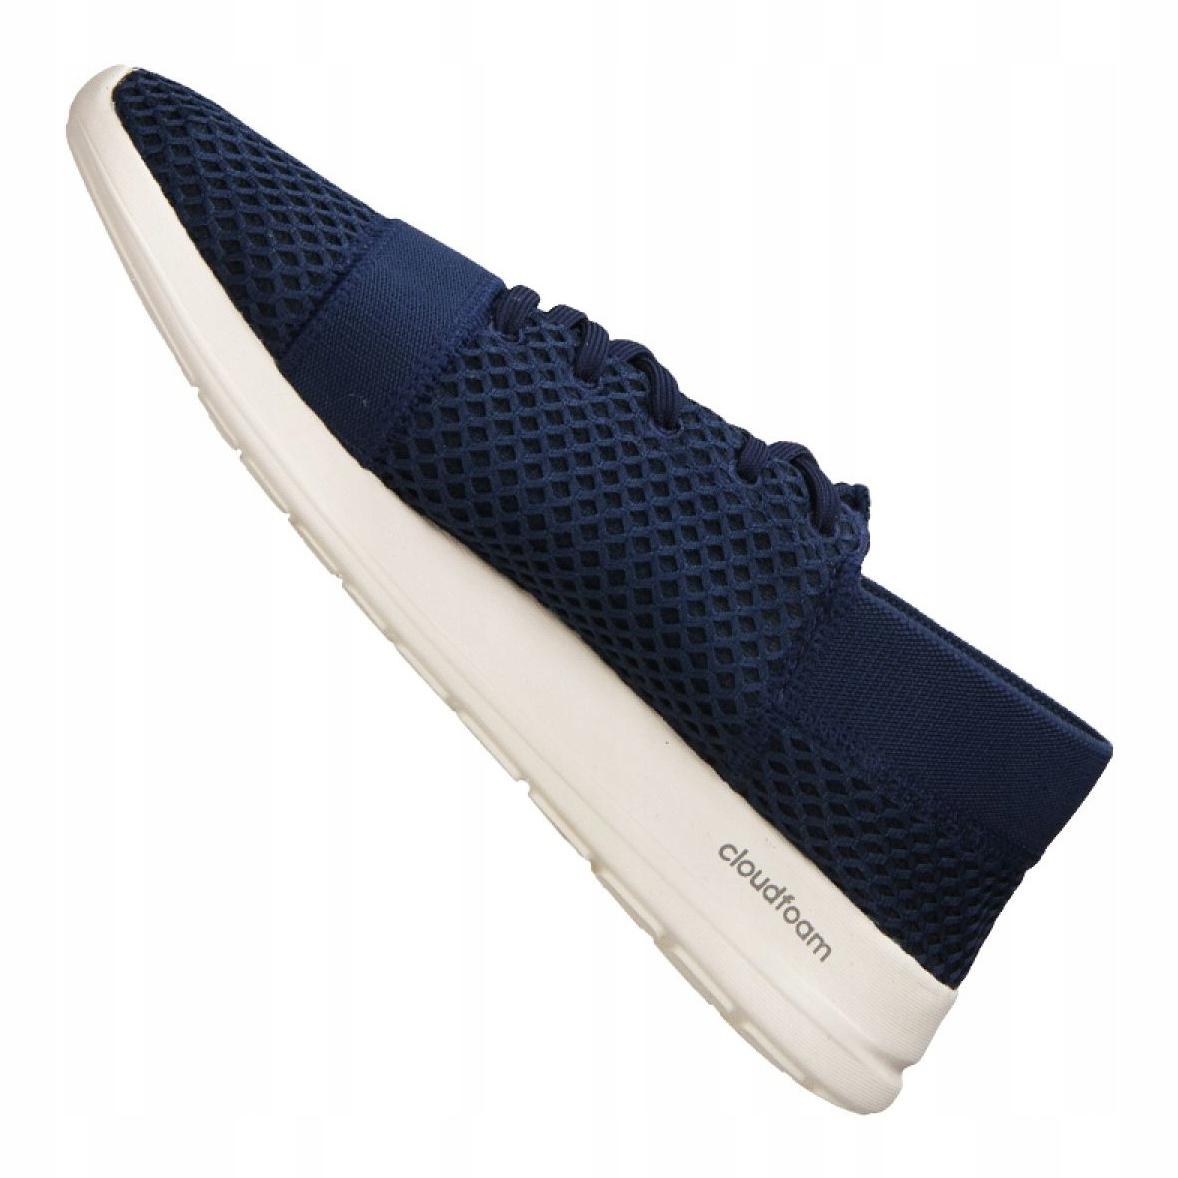 Adidas Element Refine 3M M BB4847 shoes navy